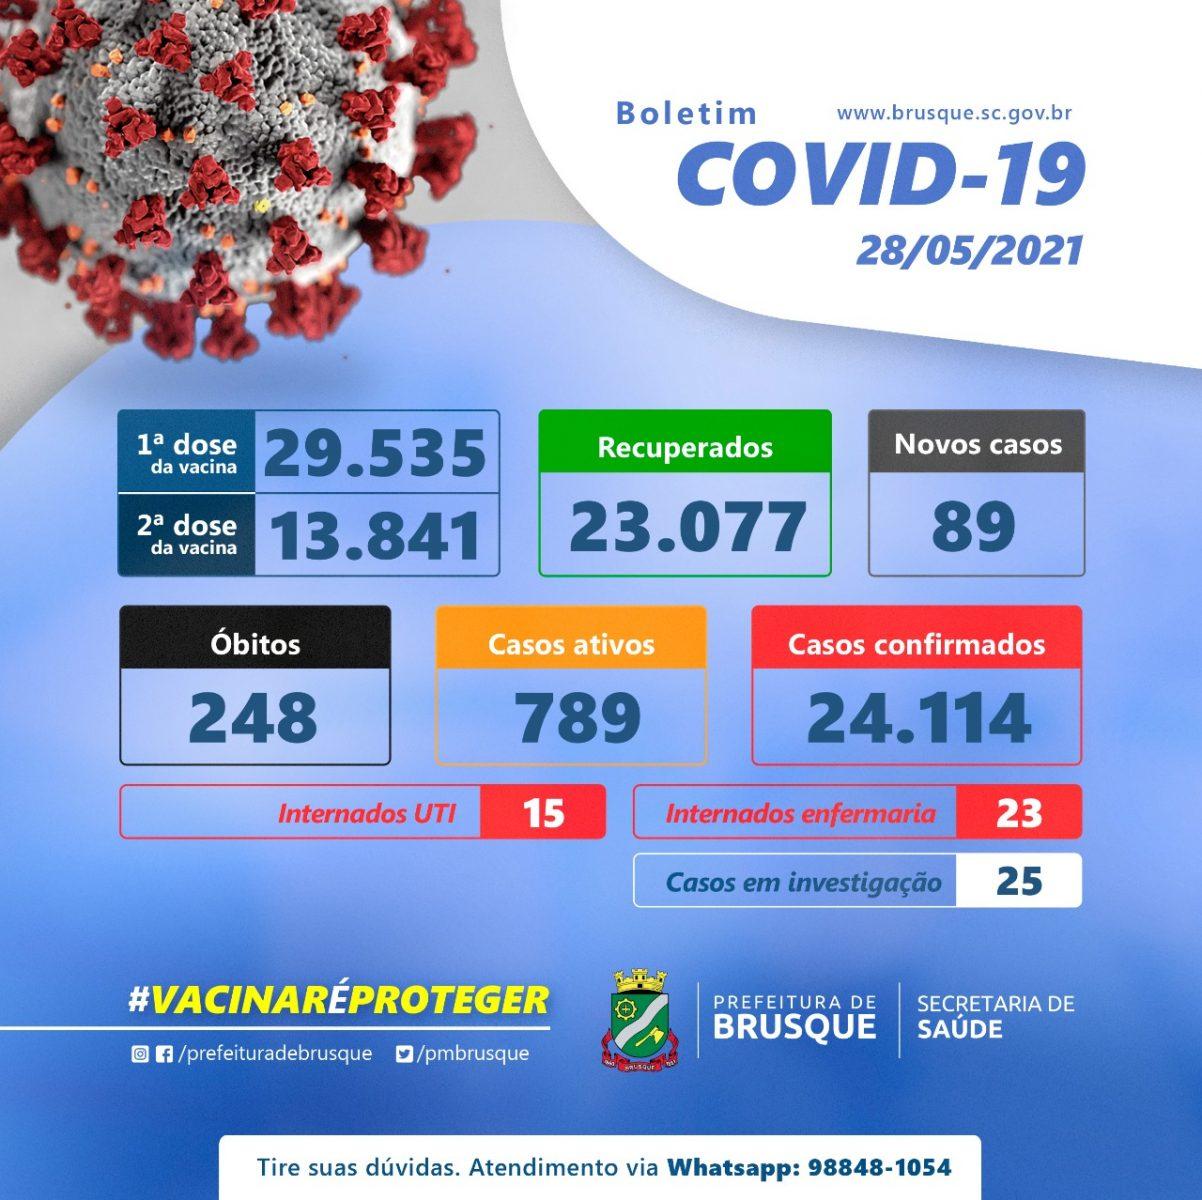 Covid-19: Confira o boletim epidemiológico desta sexta-feira (28)